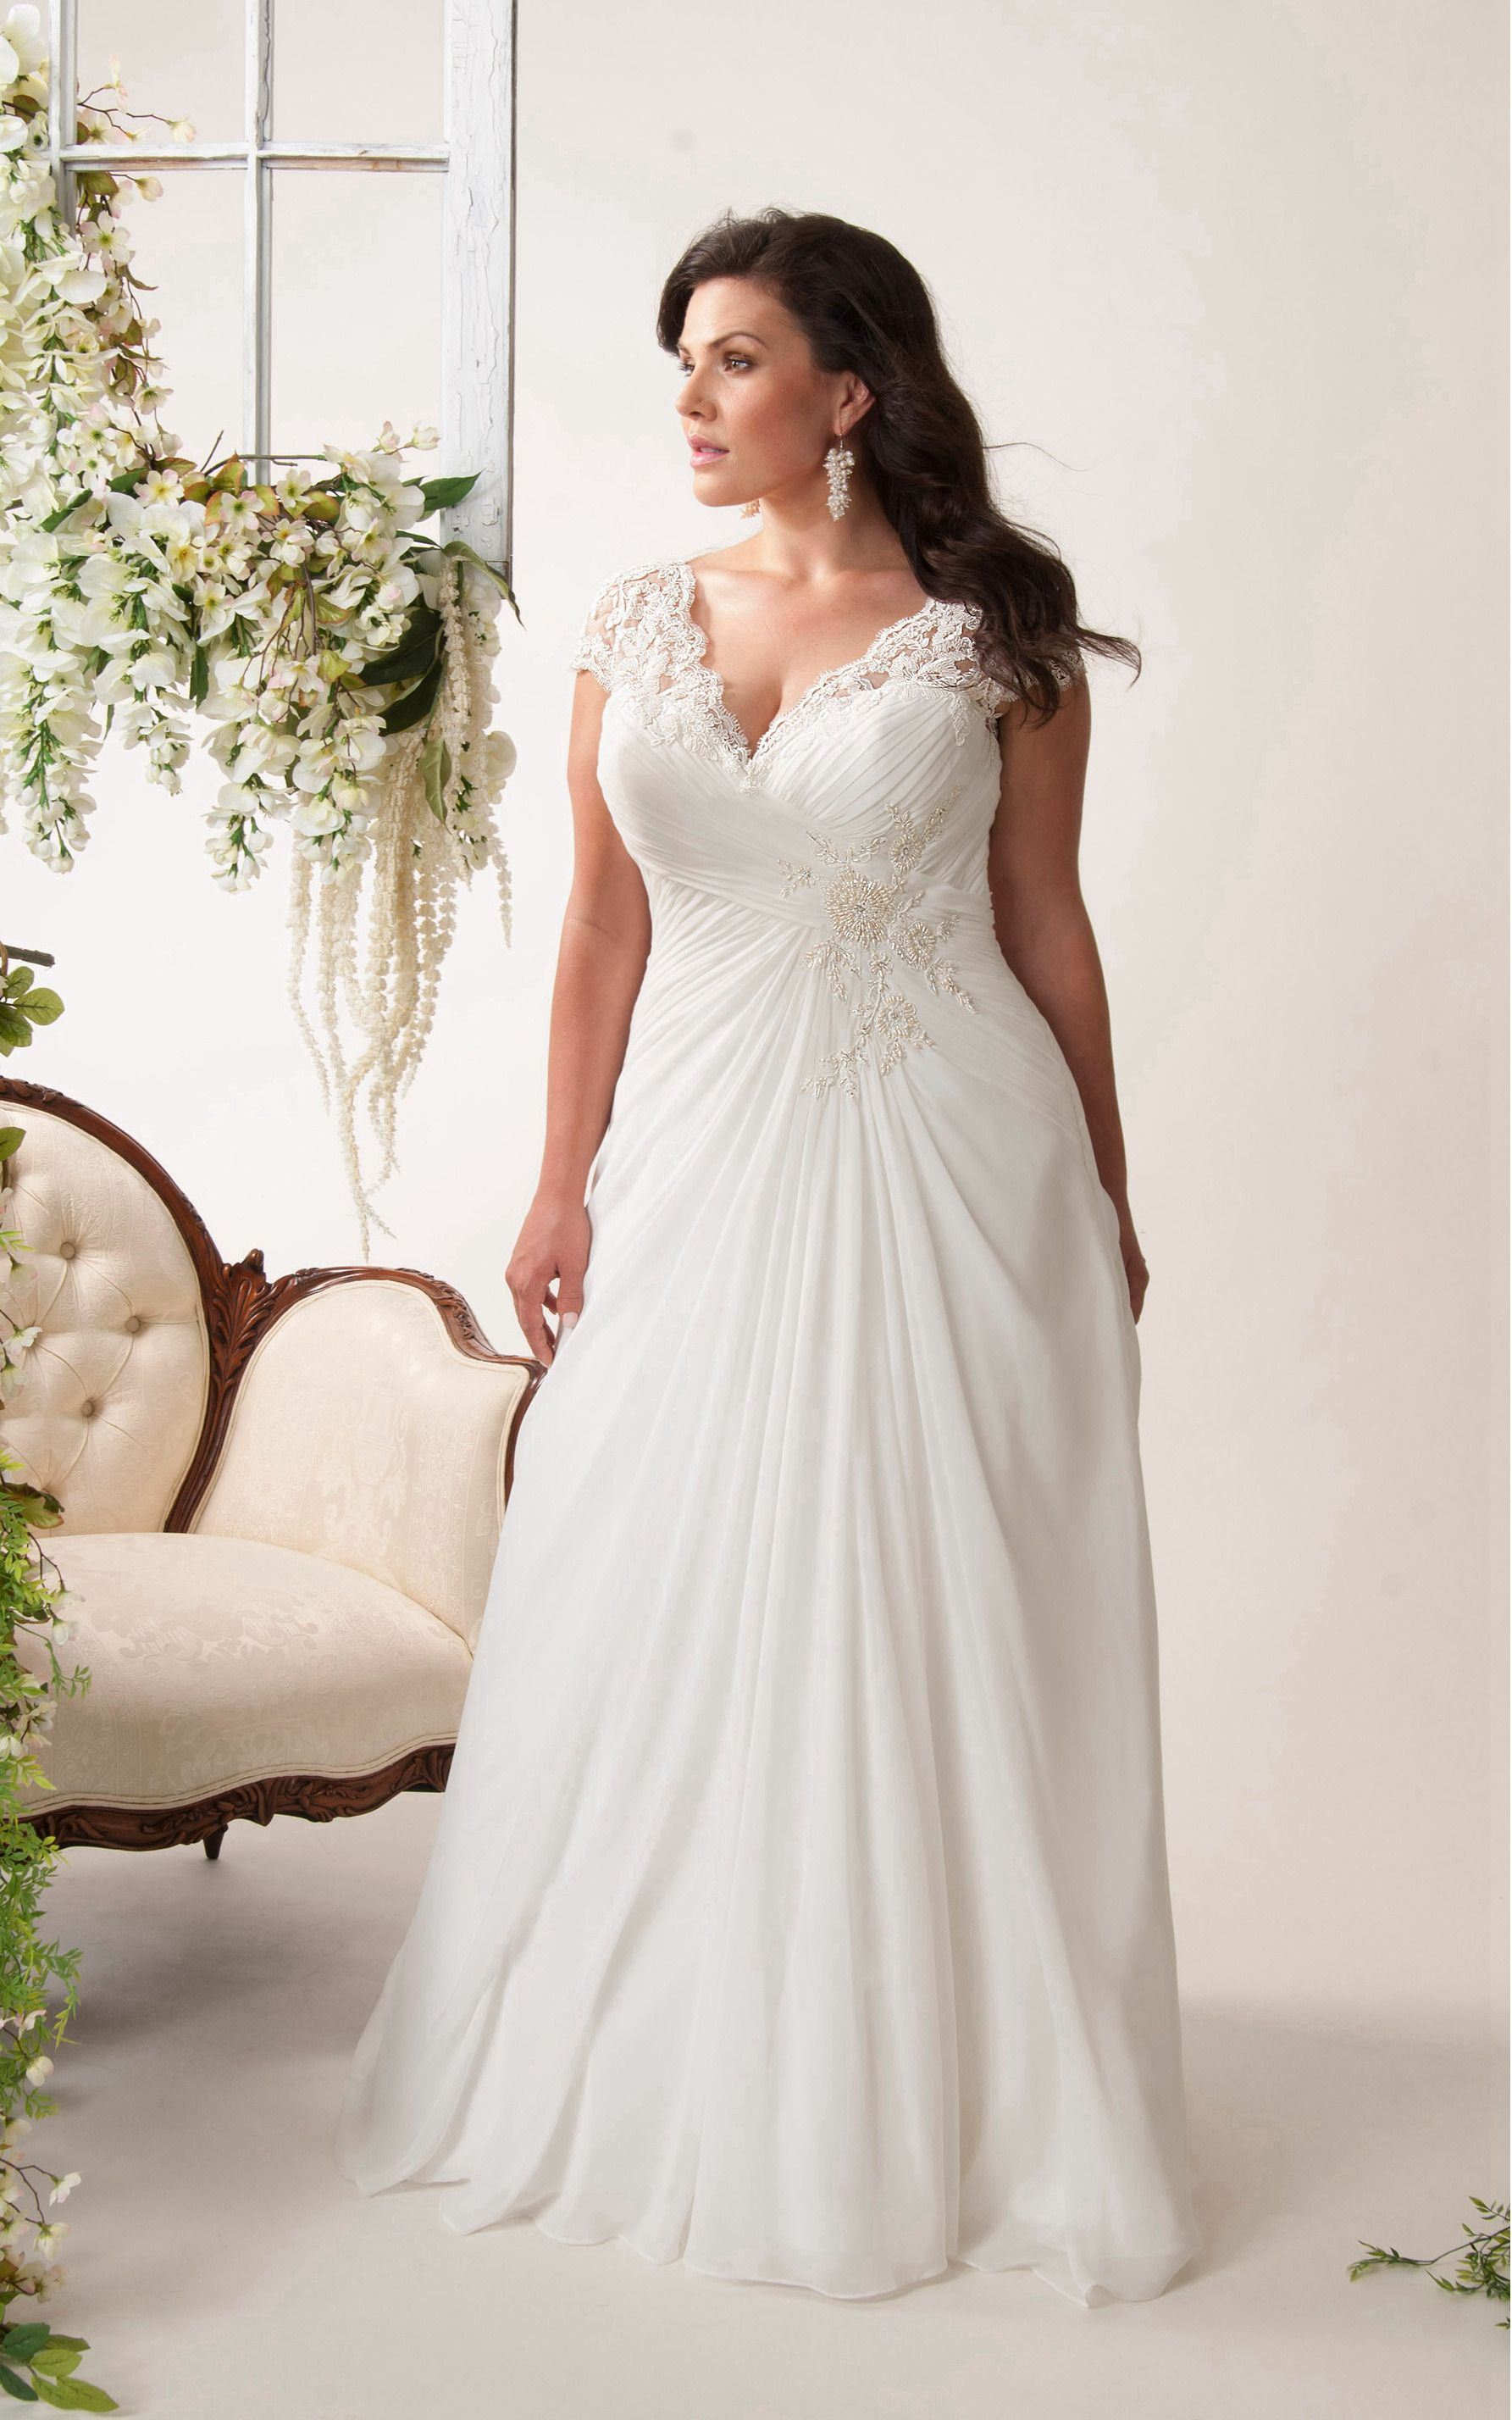 Pin On Affordable Plus Size Wedding Dress [ 2856 x 1785 Pixel ]